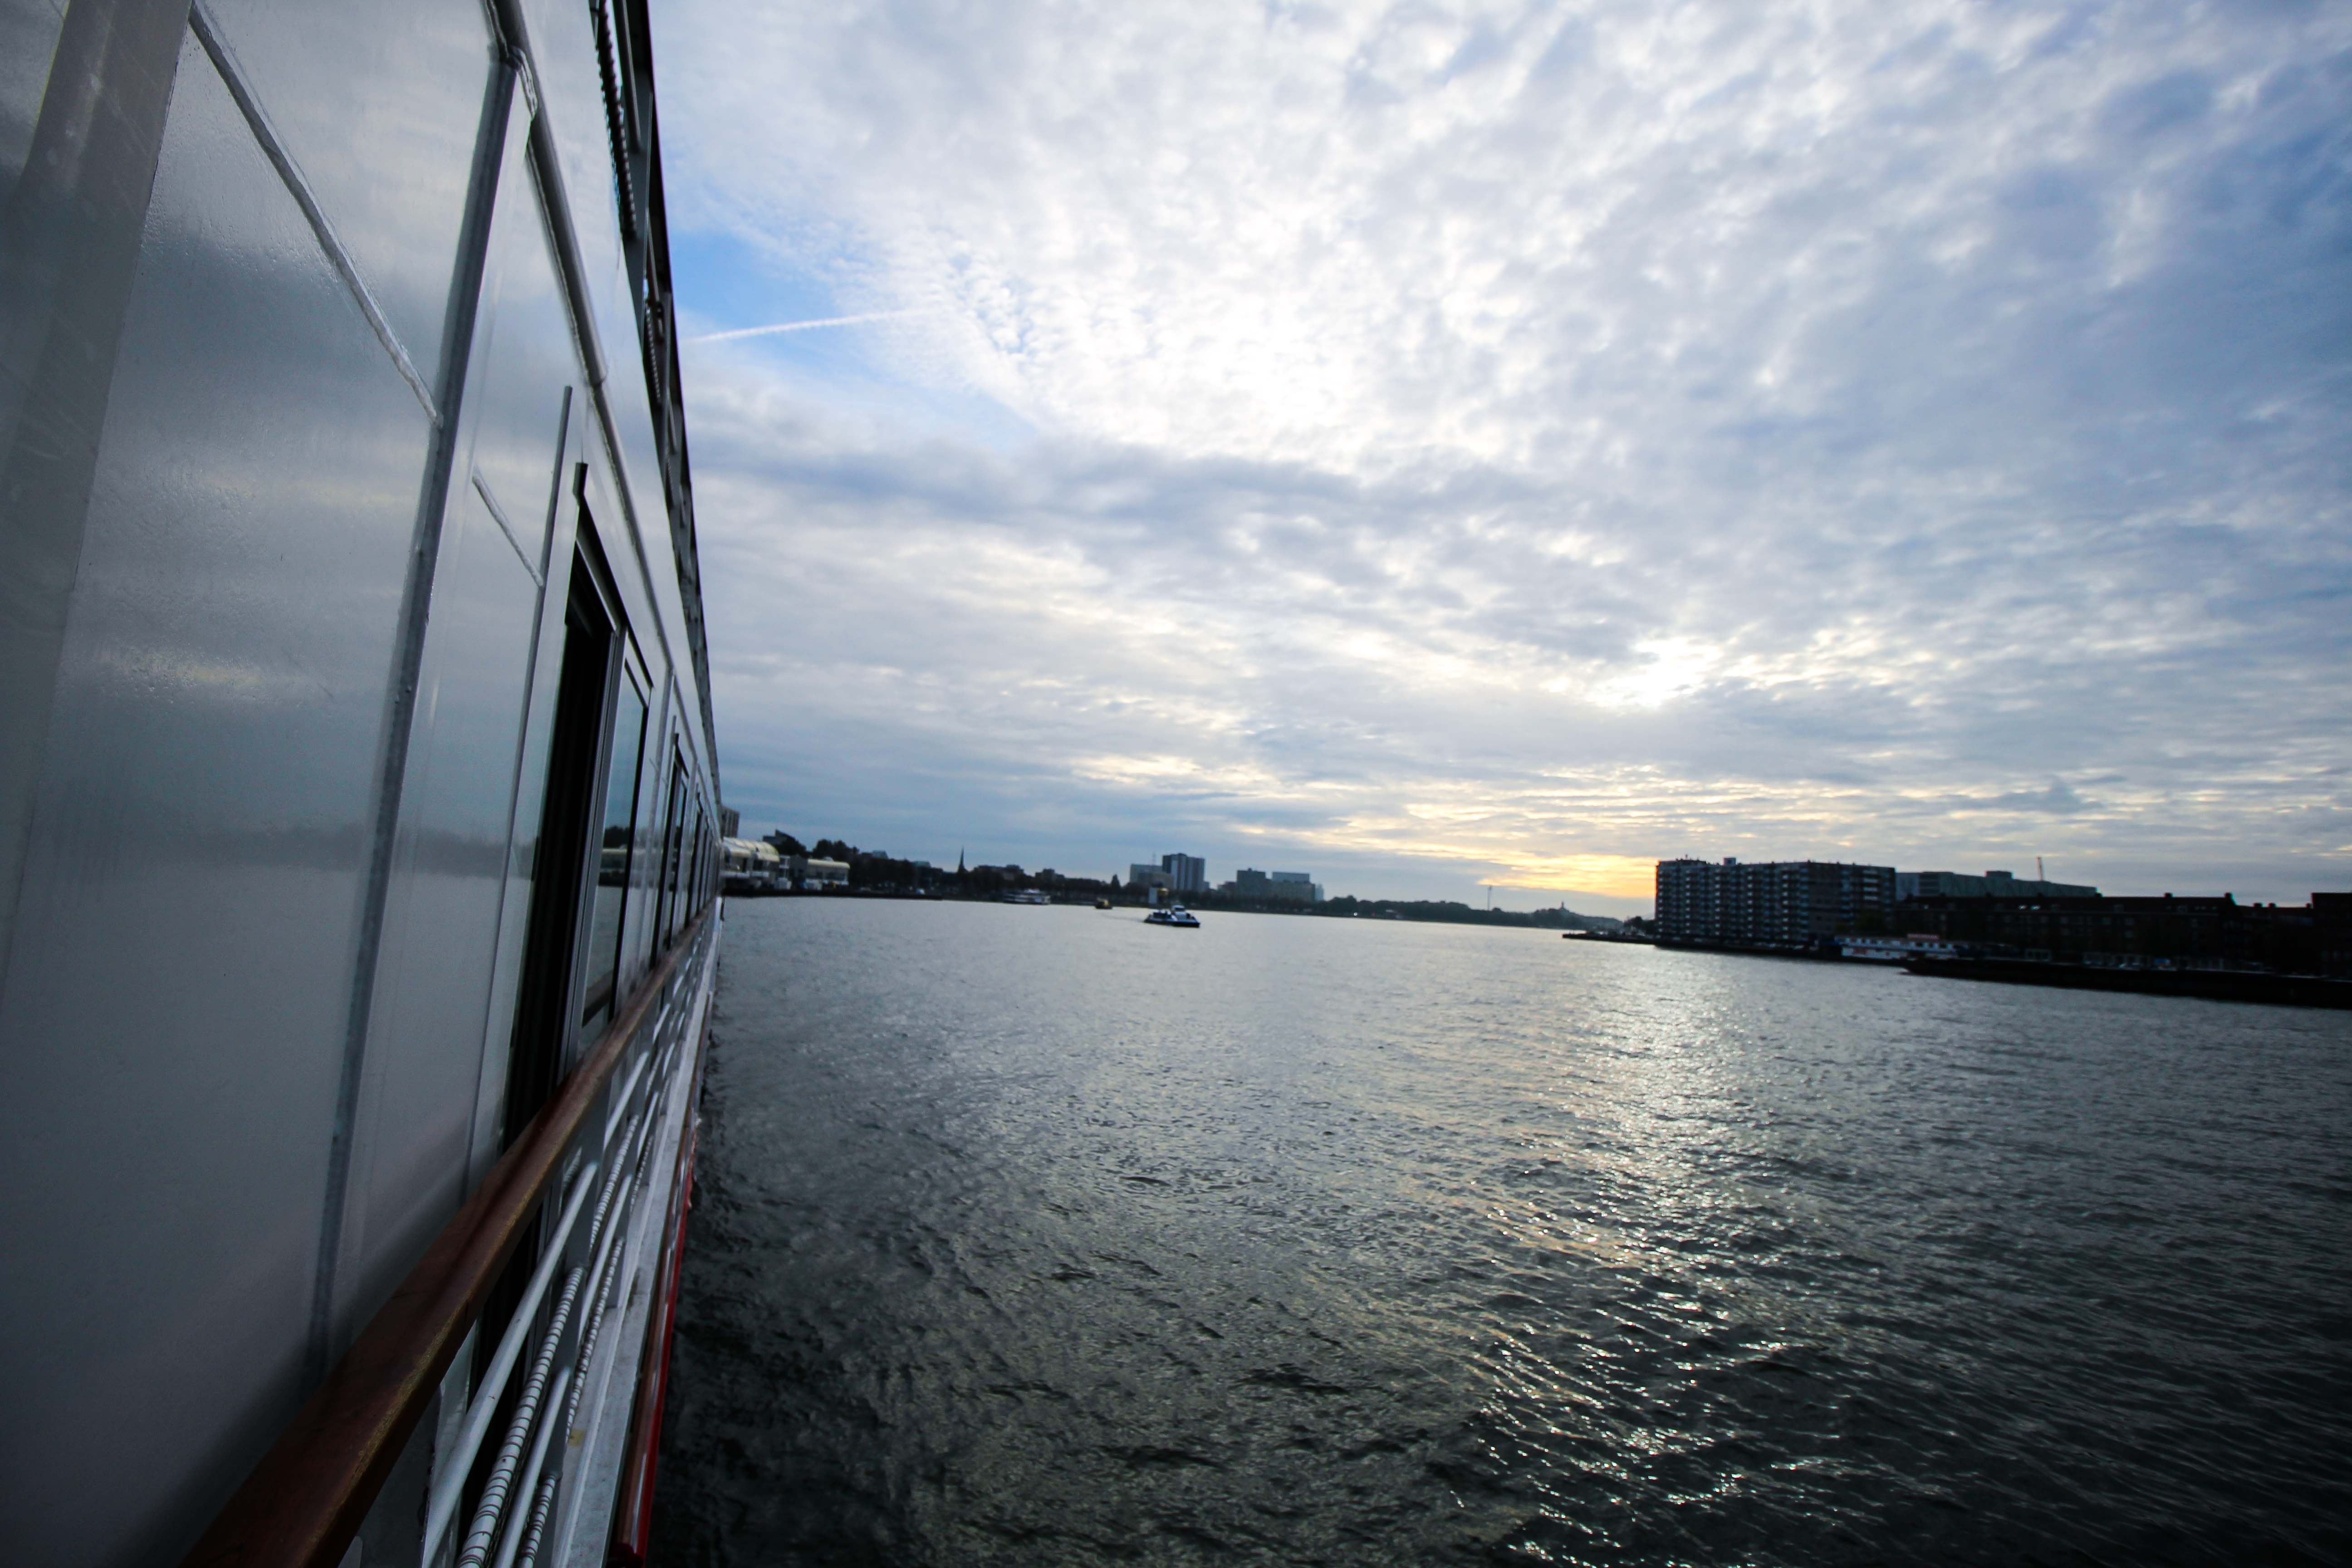 Flusskreuzfahrt A-ROSA SILVA Kreuzfahrtschiff Rhein Erlebnis Kurs Amsterdam Erfahrung Flusskreuzfahrt Reiseblog Fluss